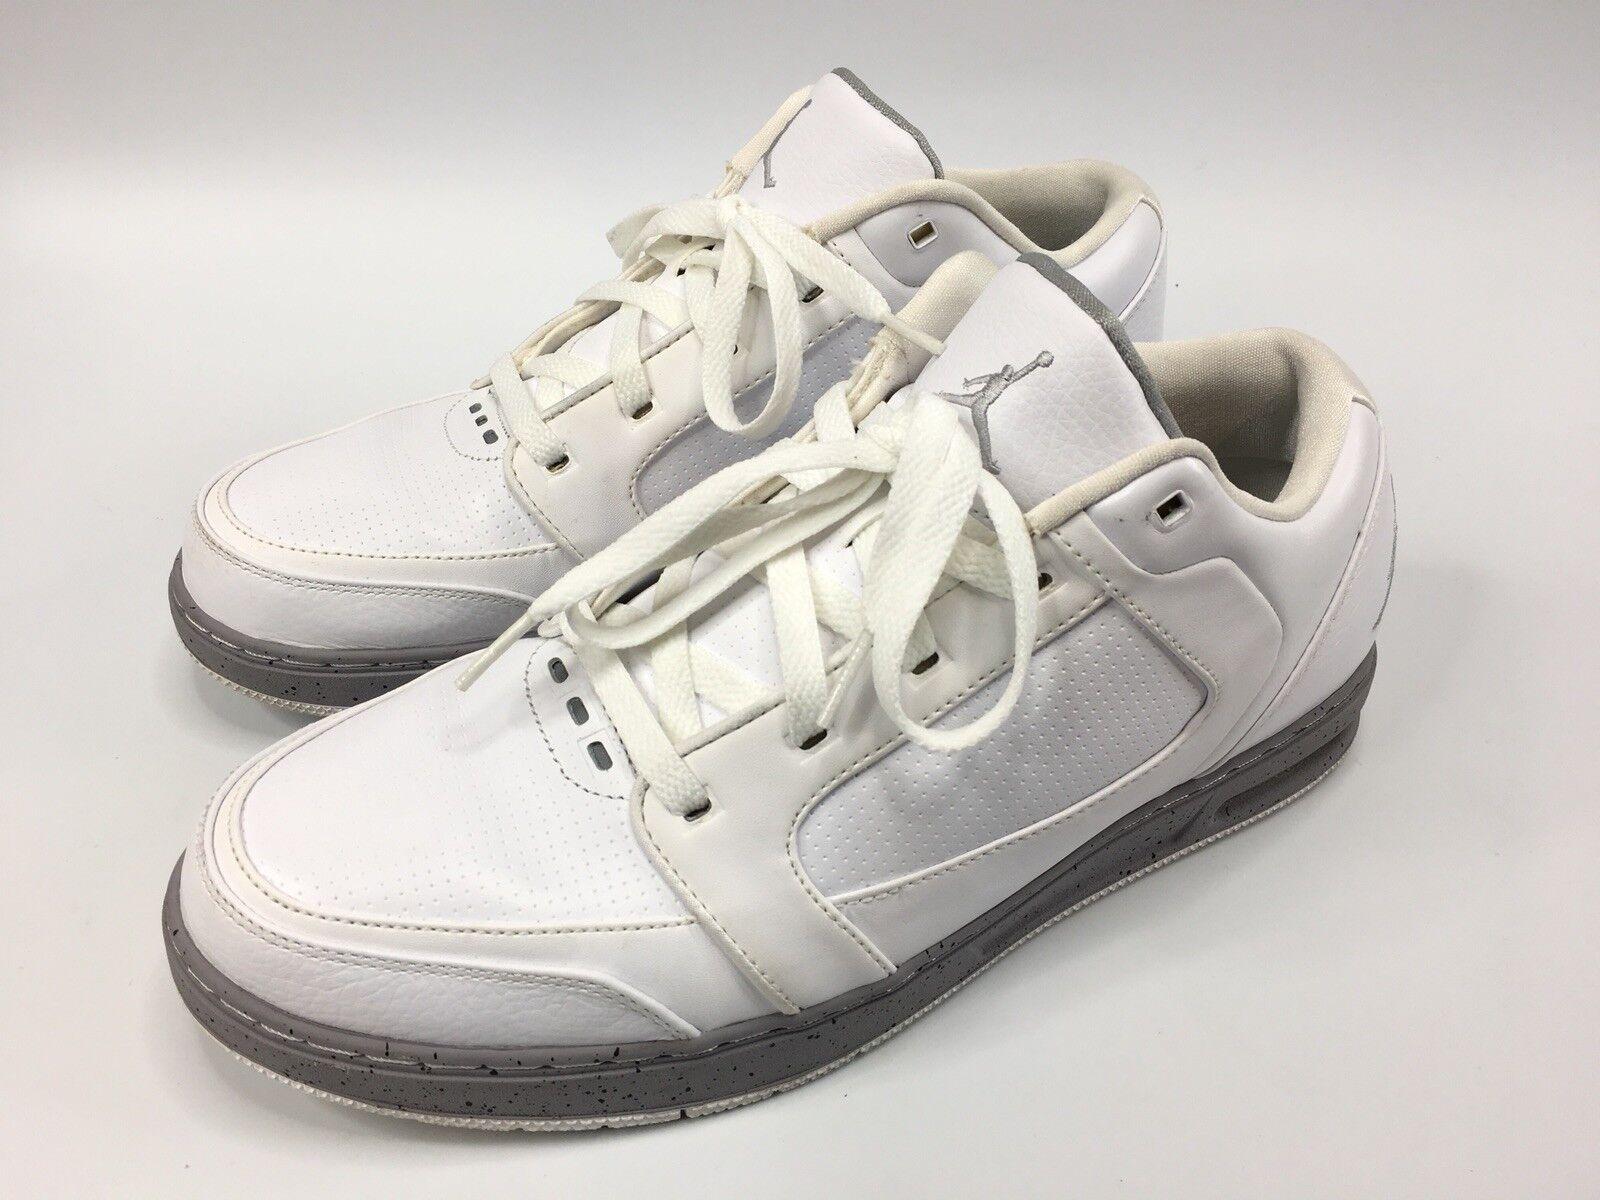 Nike air jordan classico basso 2011 white 395361-103 scarpe Uomo 11